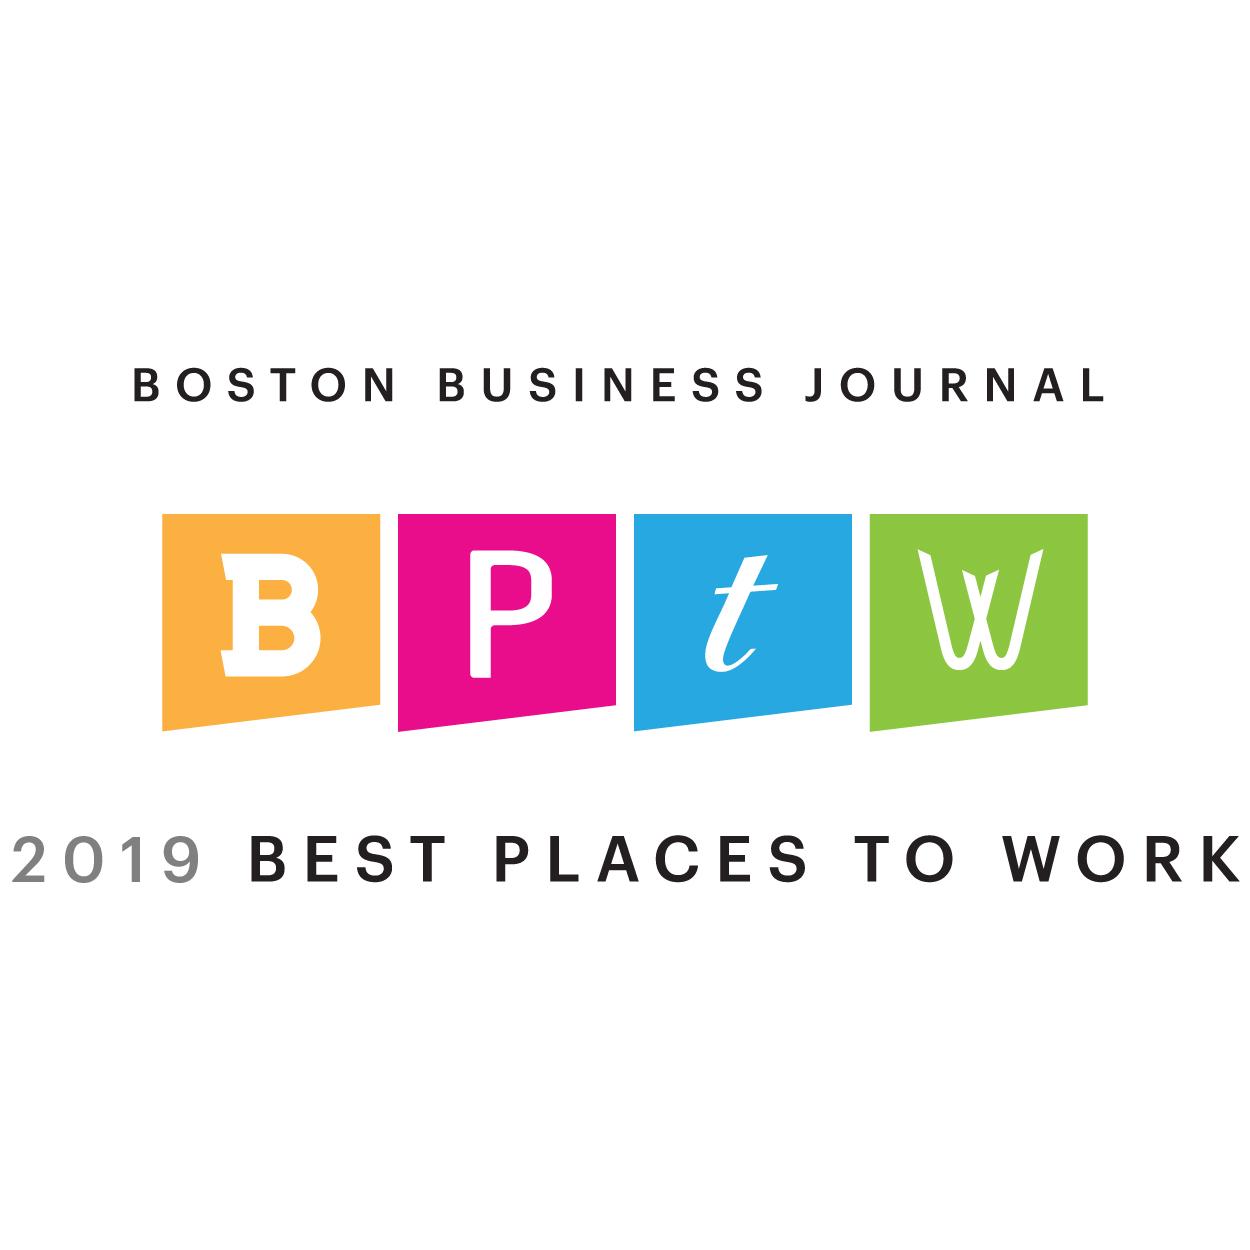 2019 BPTW_horz.jpg